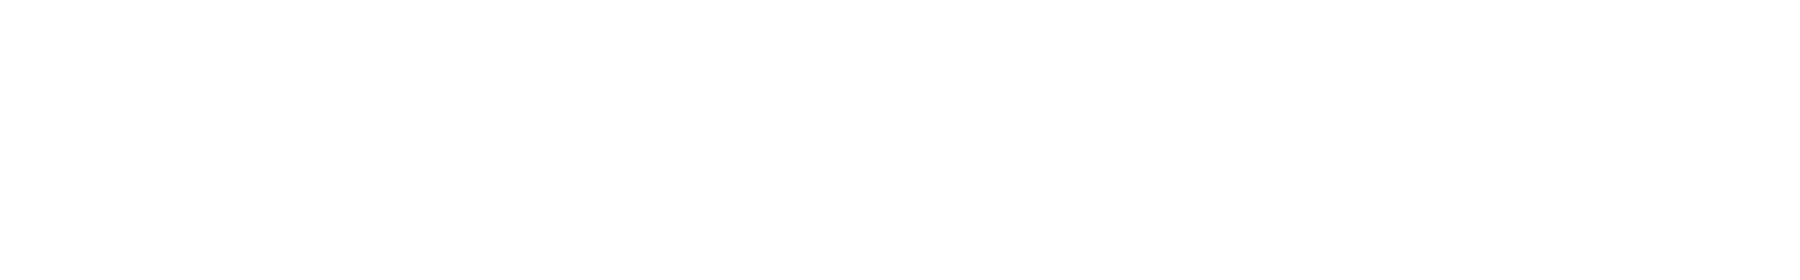 mb 808 1